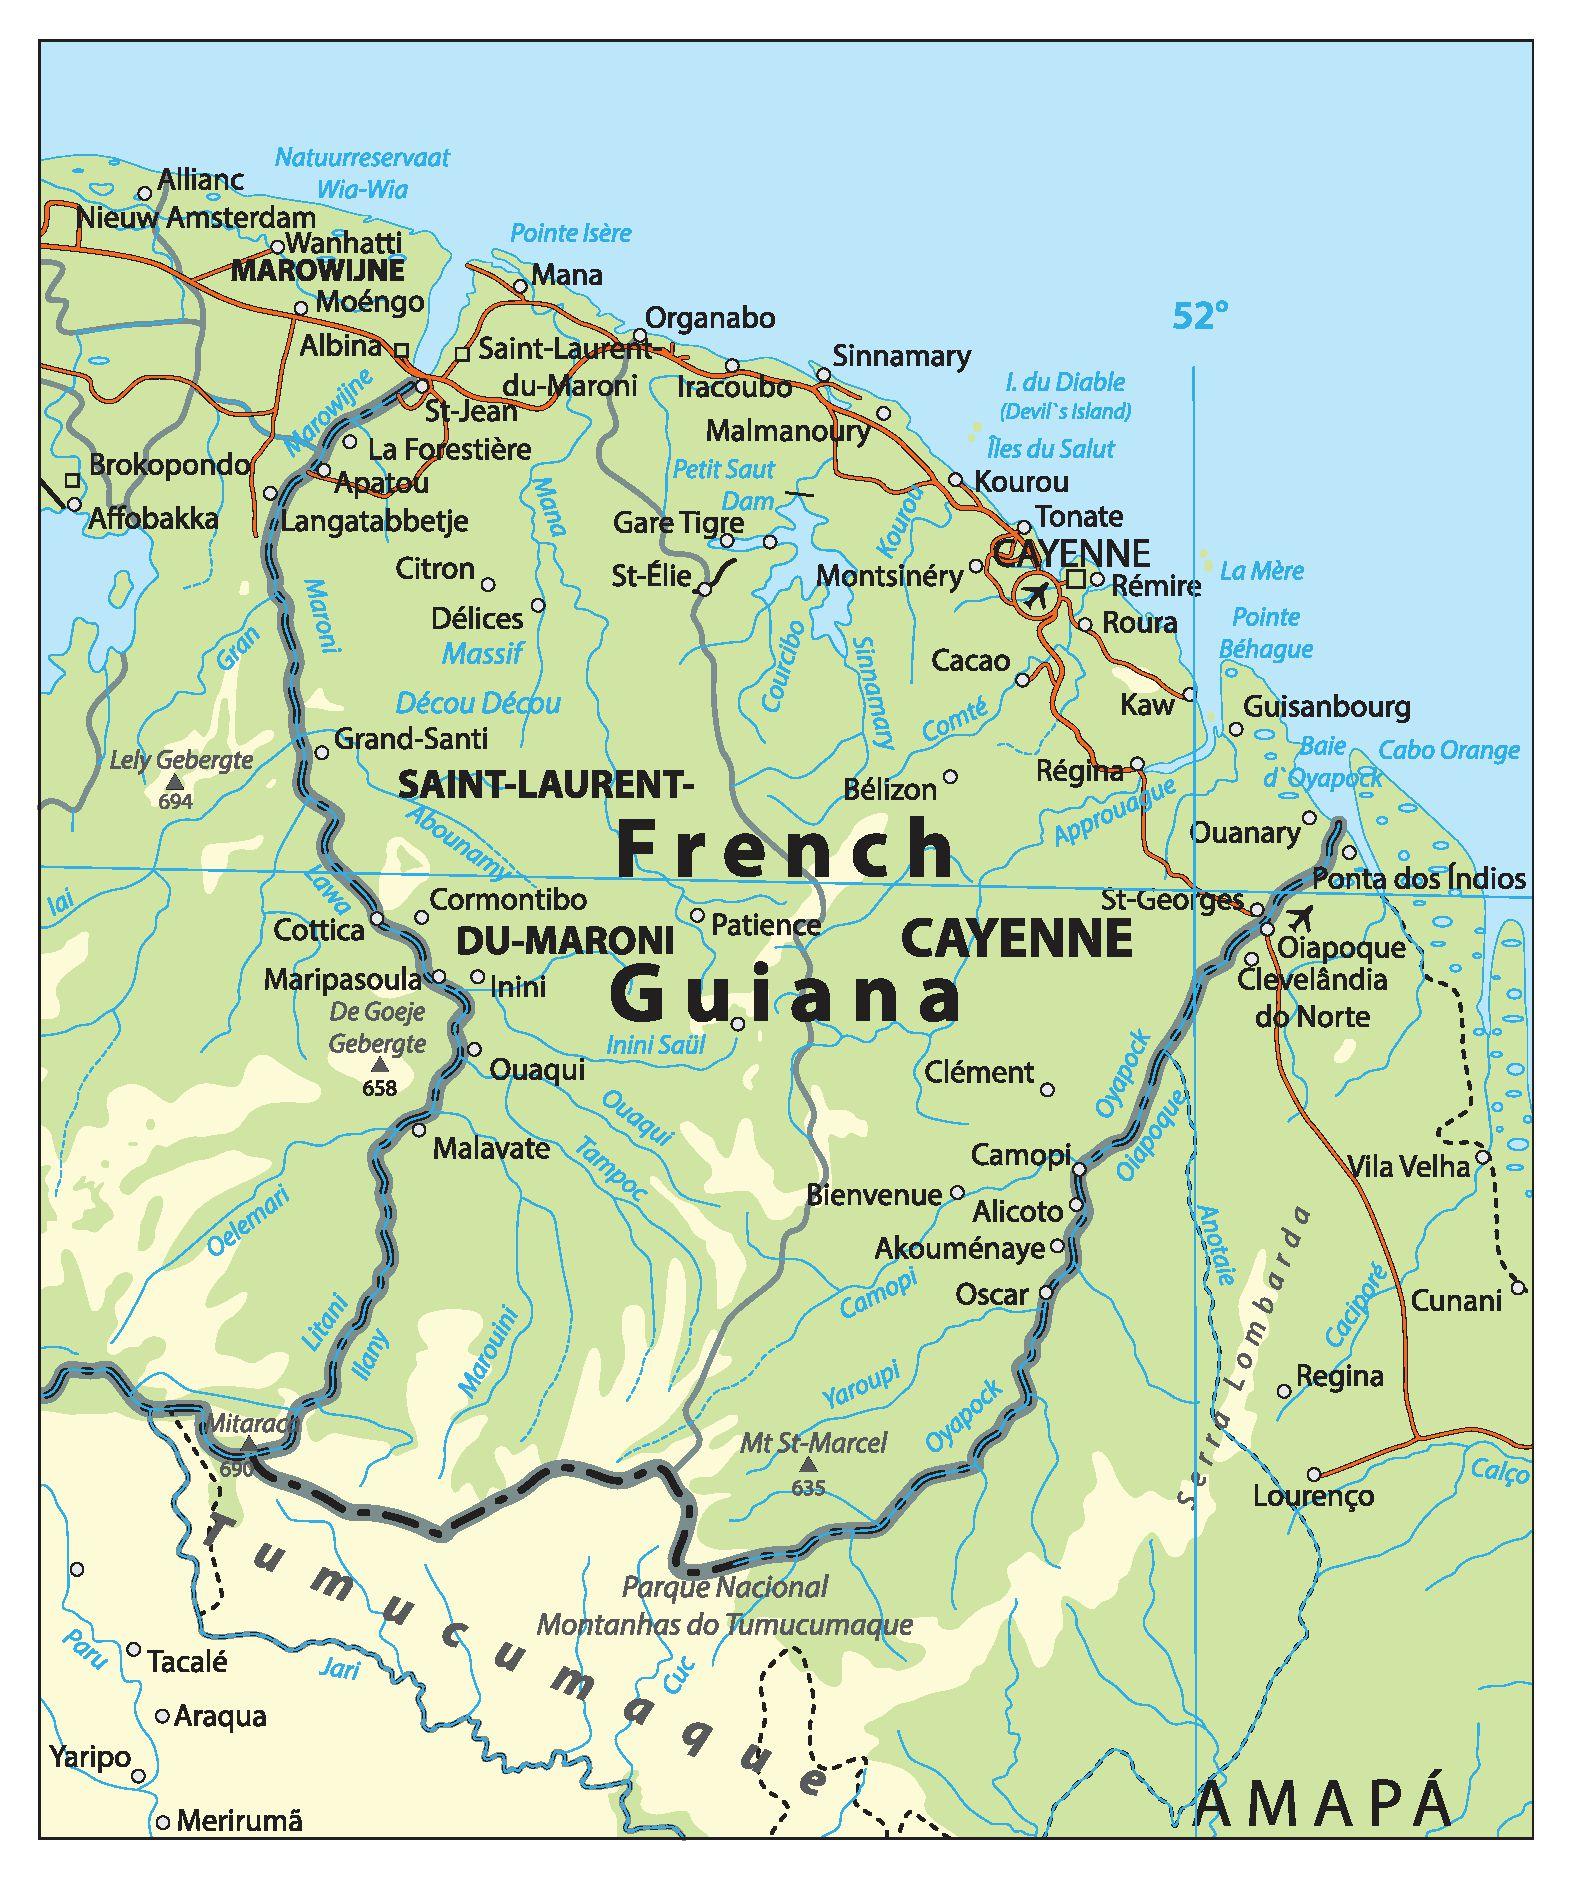 guyane francaise